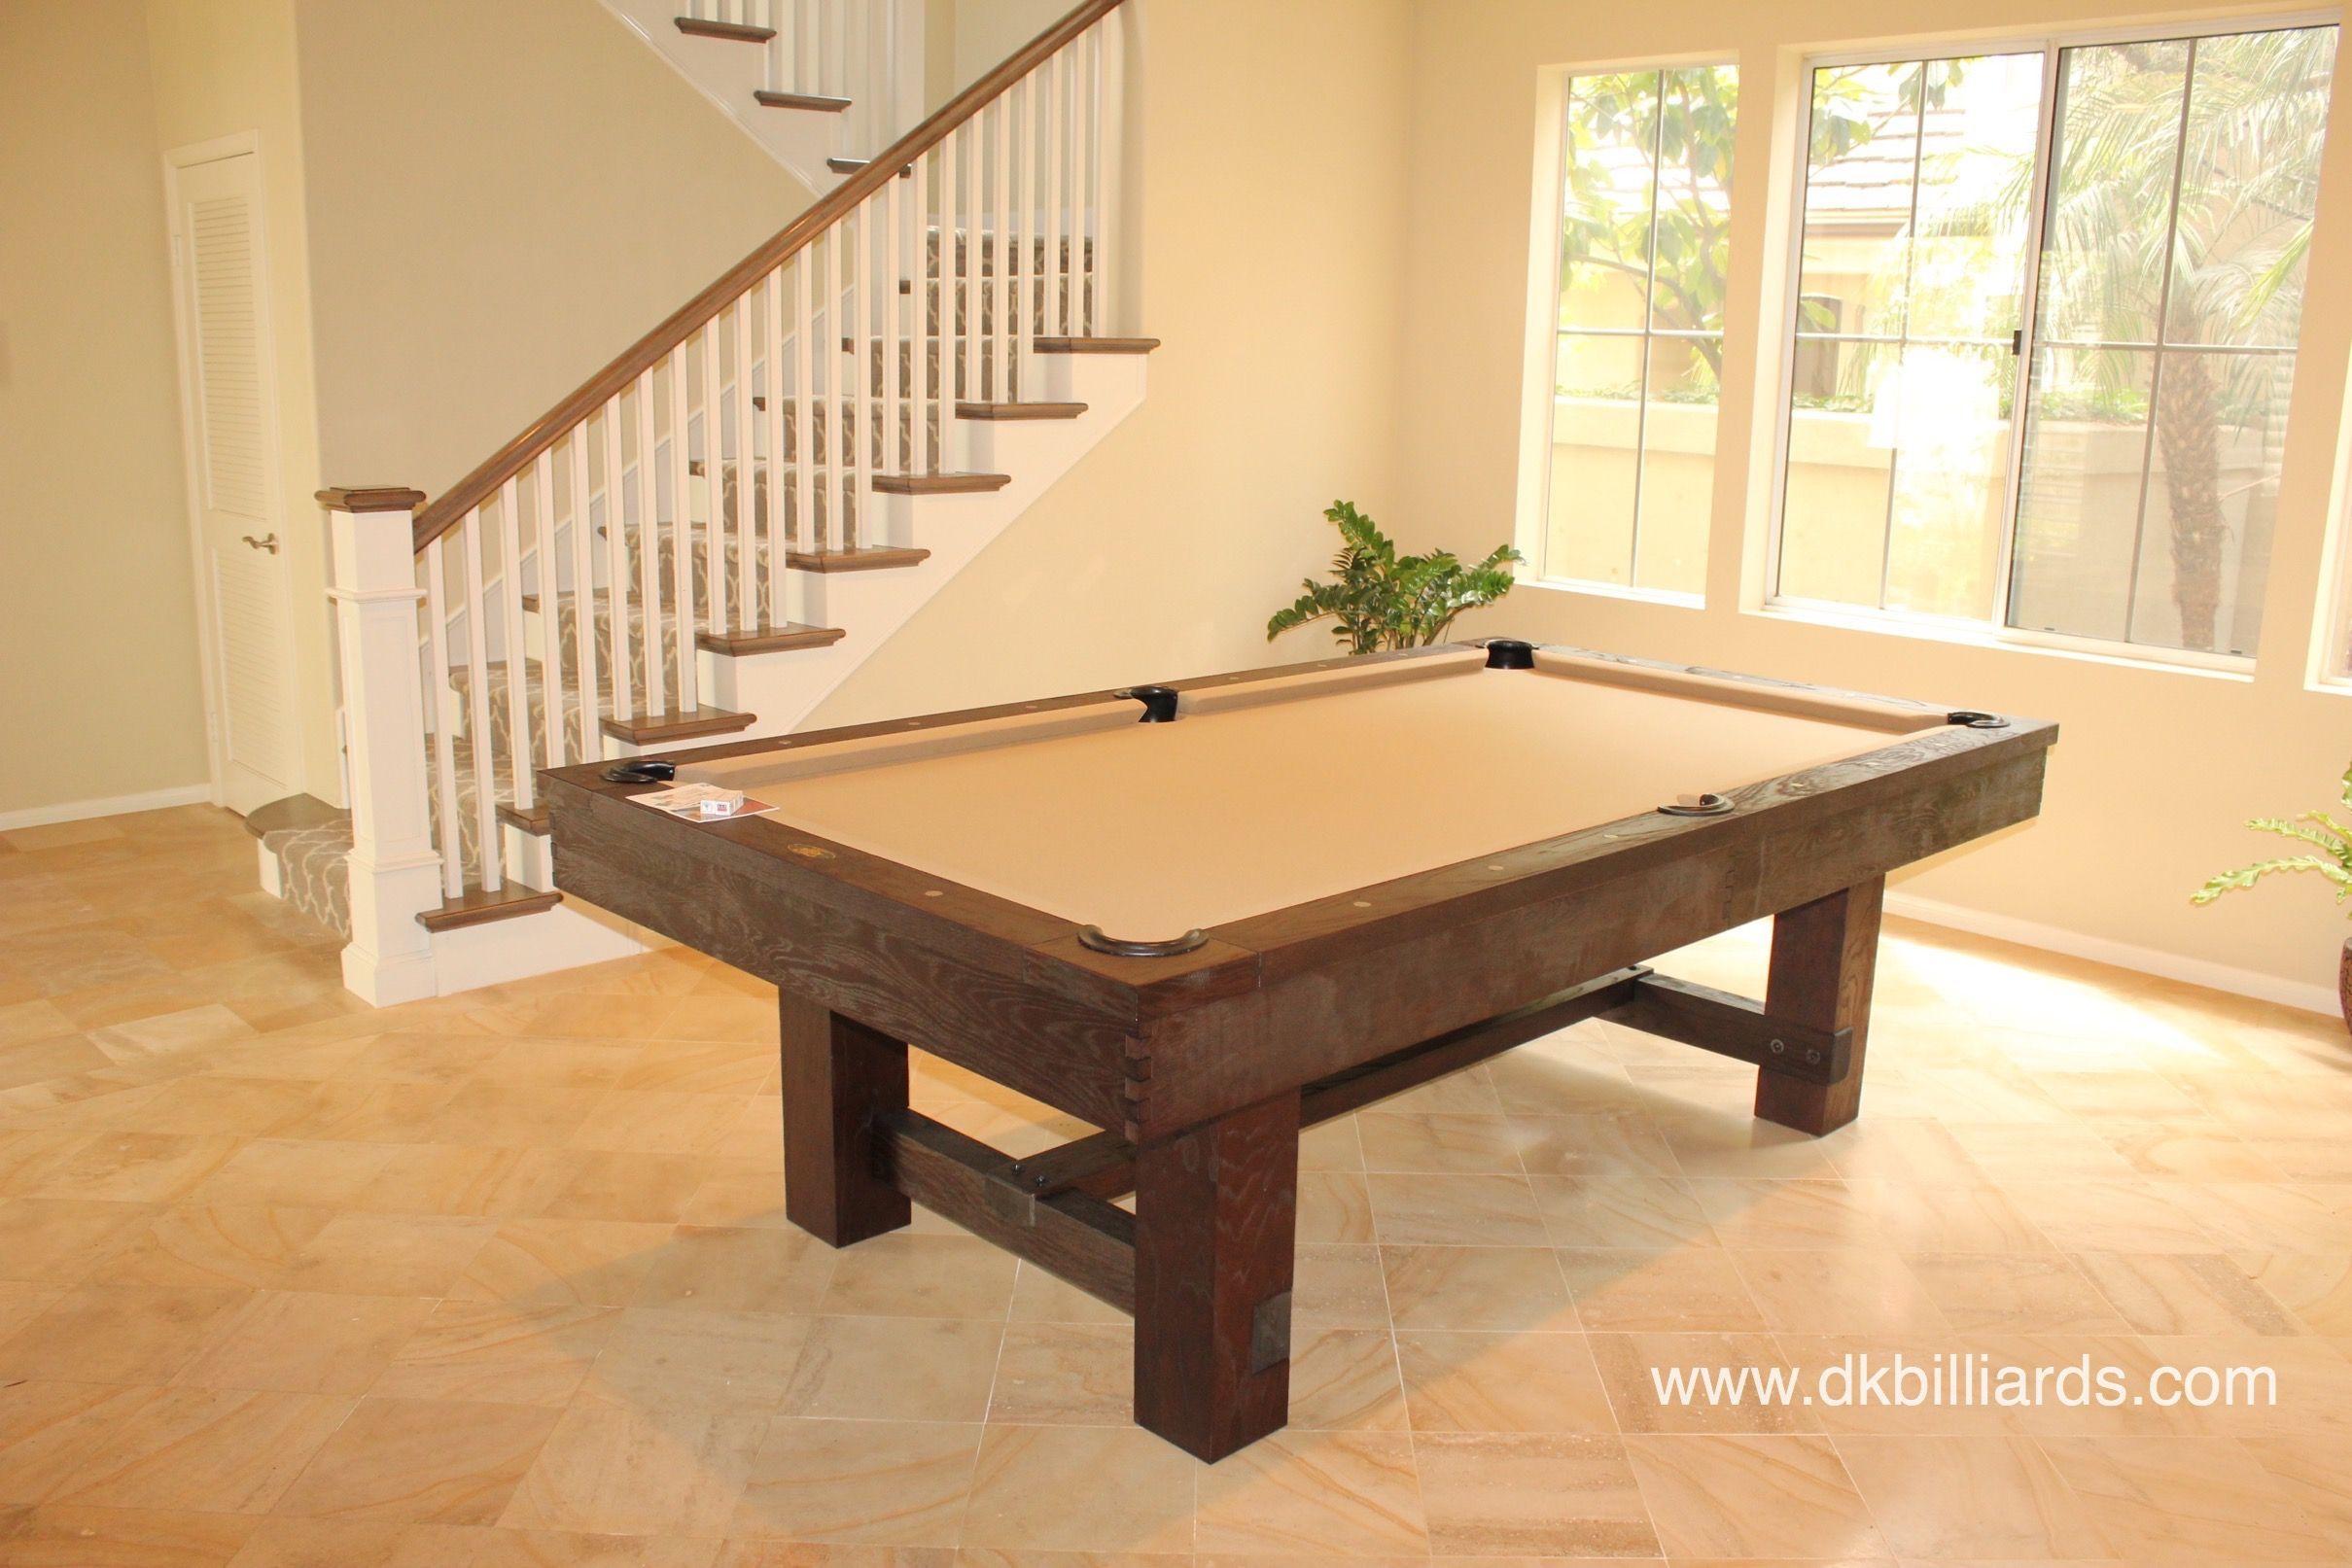 Rustic Pool Table For Beach House Ideias